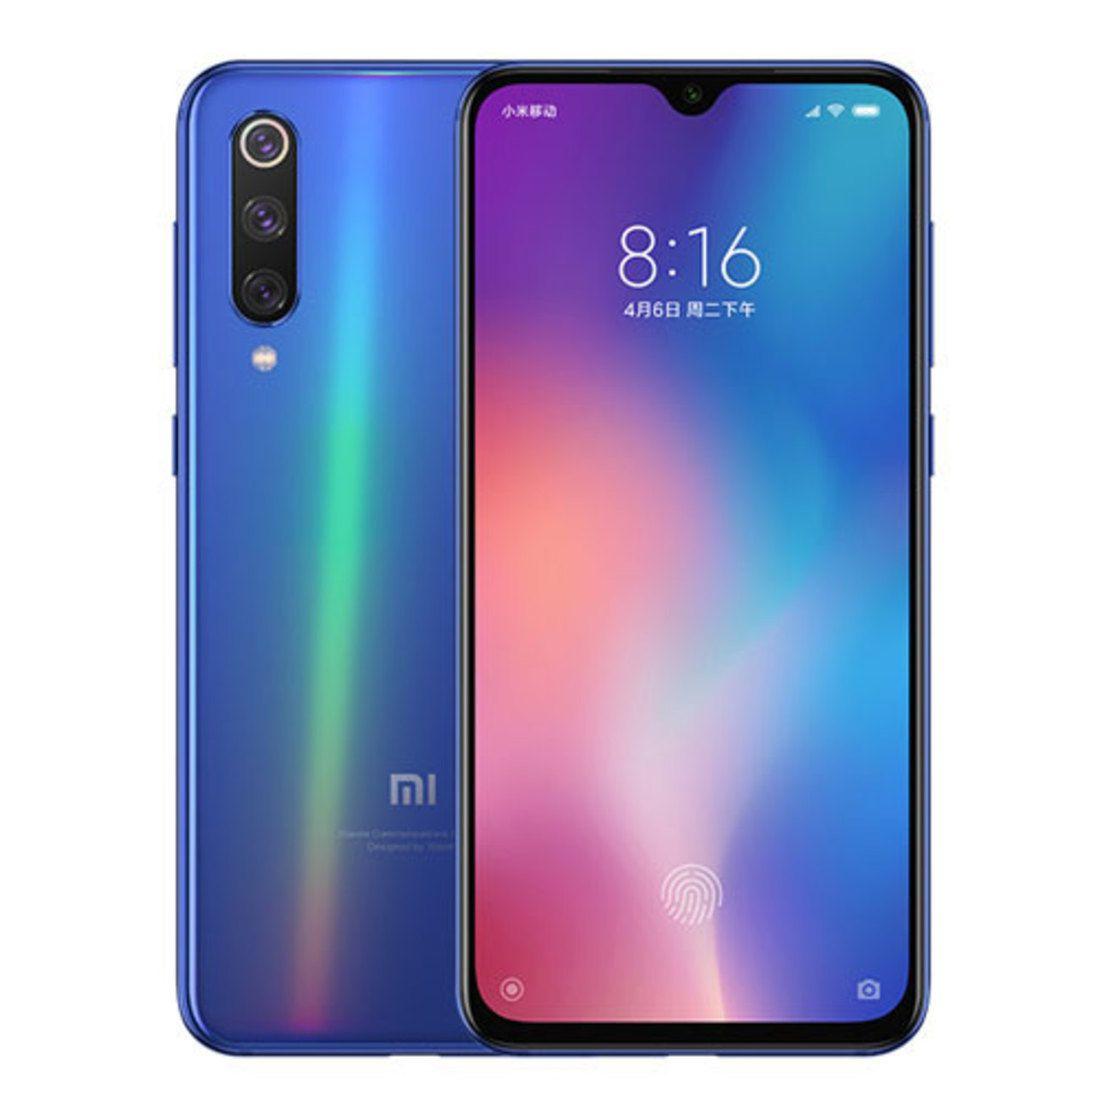 Smartphone Mi 9 SE 6GB Ram Tela 5.97 64GB Camera Tripla 48+13+8MP - Azul  - PAGDEPOIS